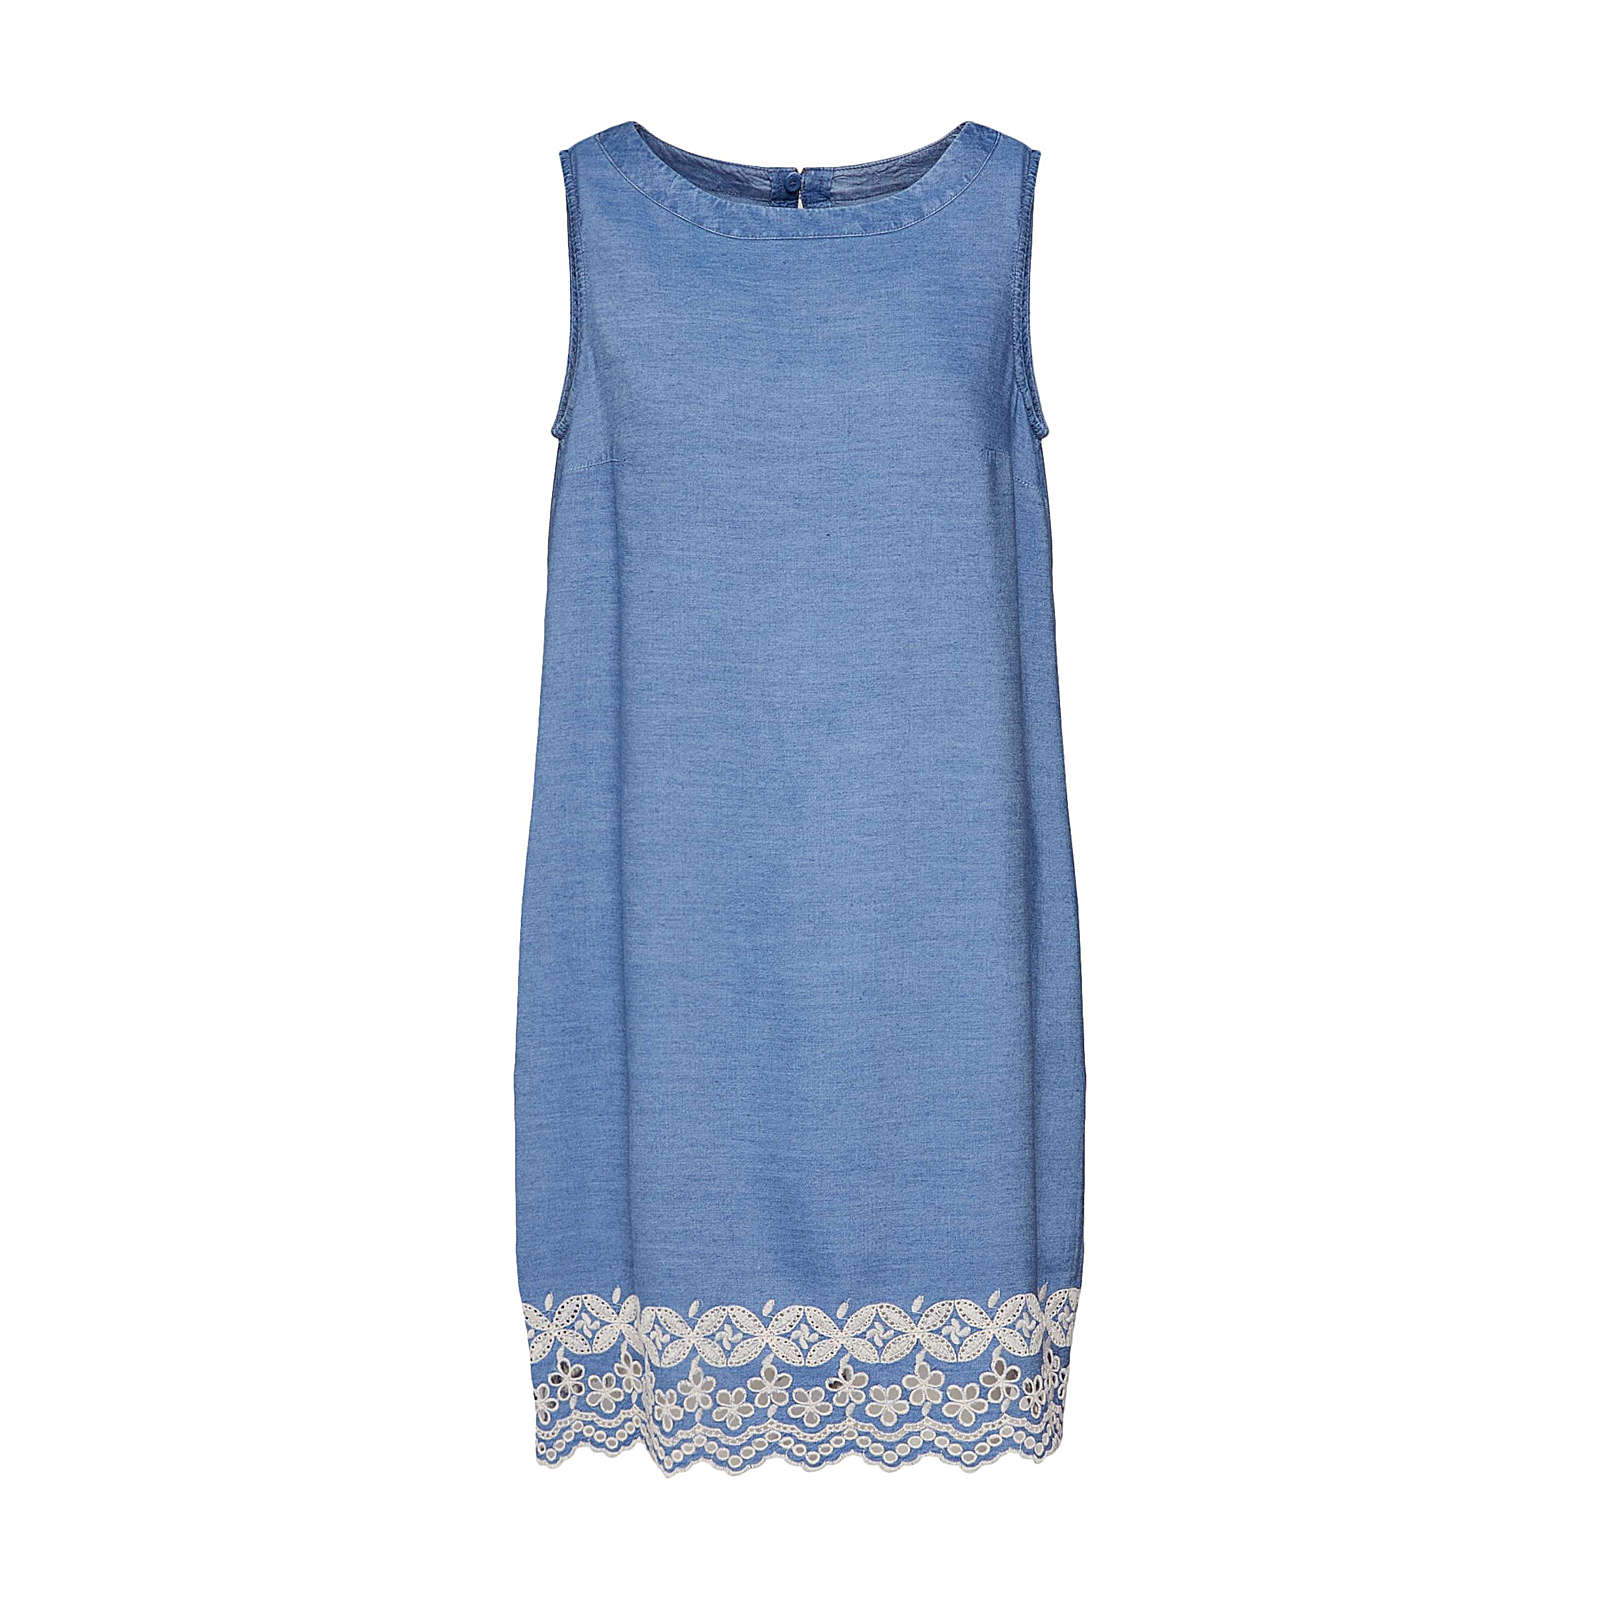 ESPRIT Kleid Jeanskleider blue denim Damen Gr. 42